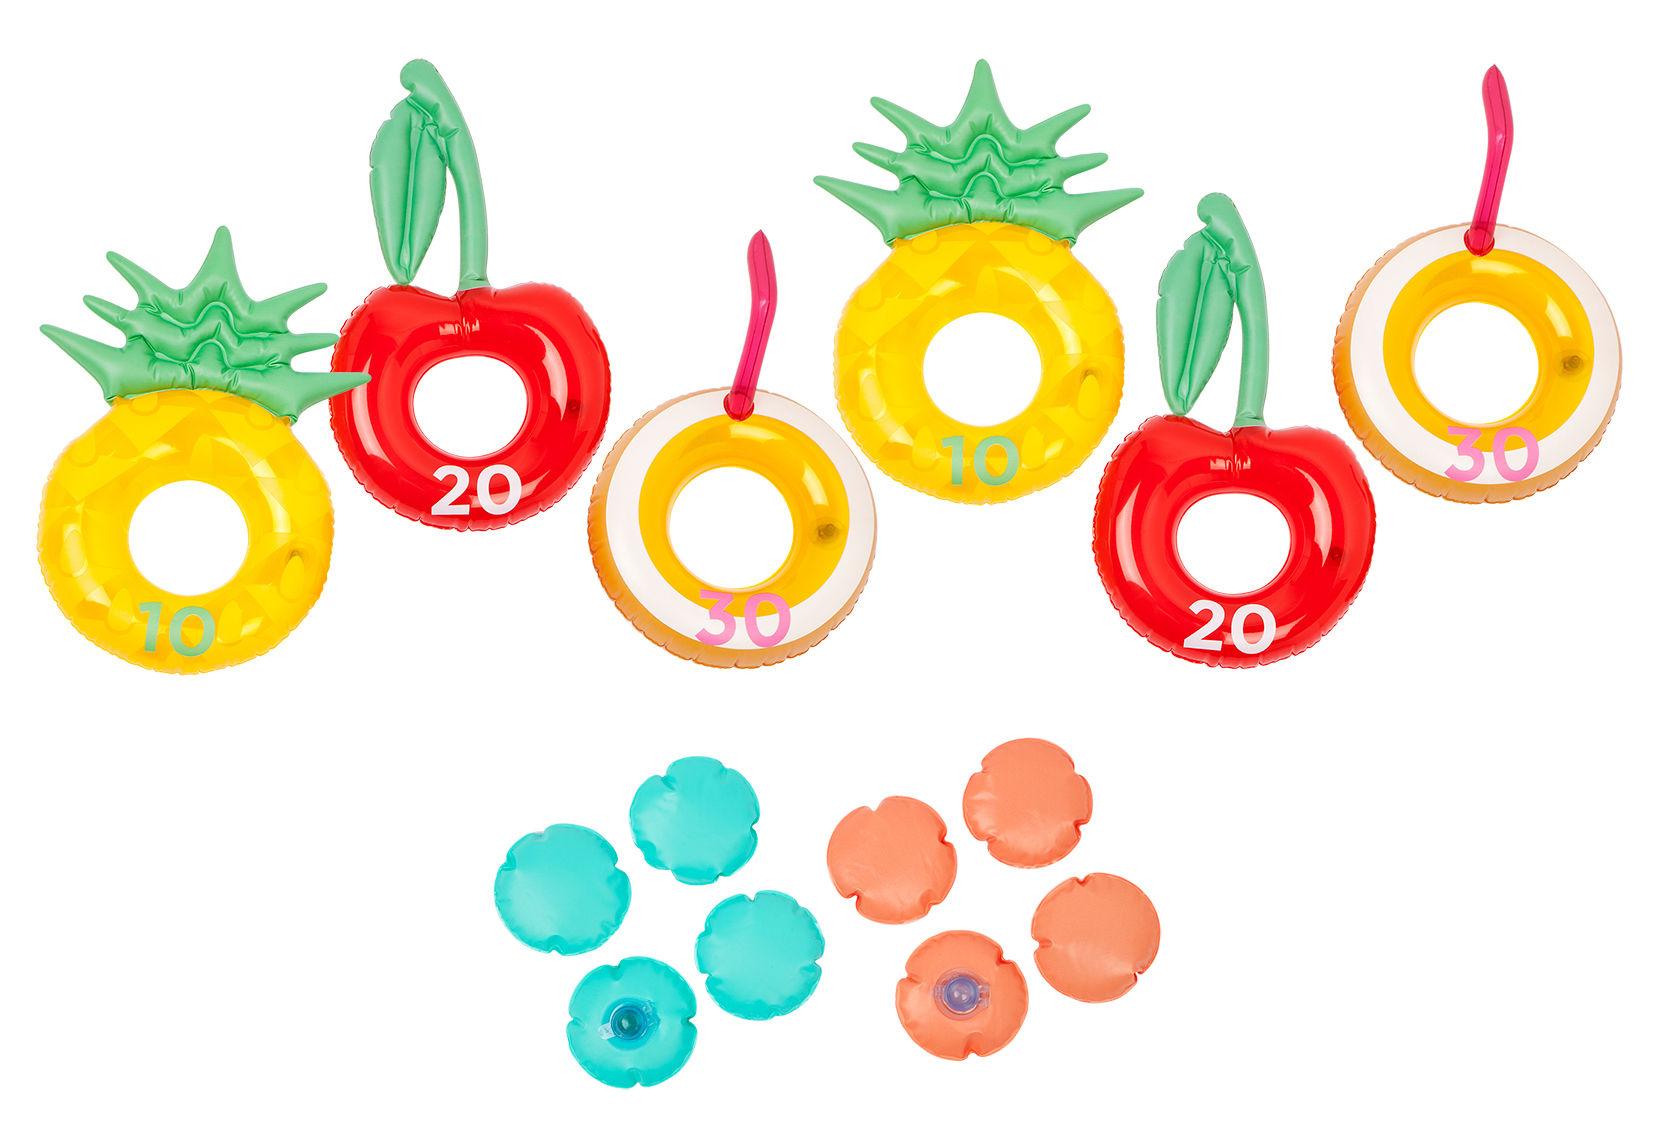 Decoration - Children's Home Accessories - Piña Colada Dexterity Game - / Inflatable & floating by Sunnylife - Piña Colada - Non-toxic PVC